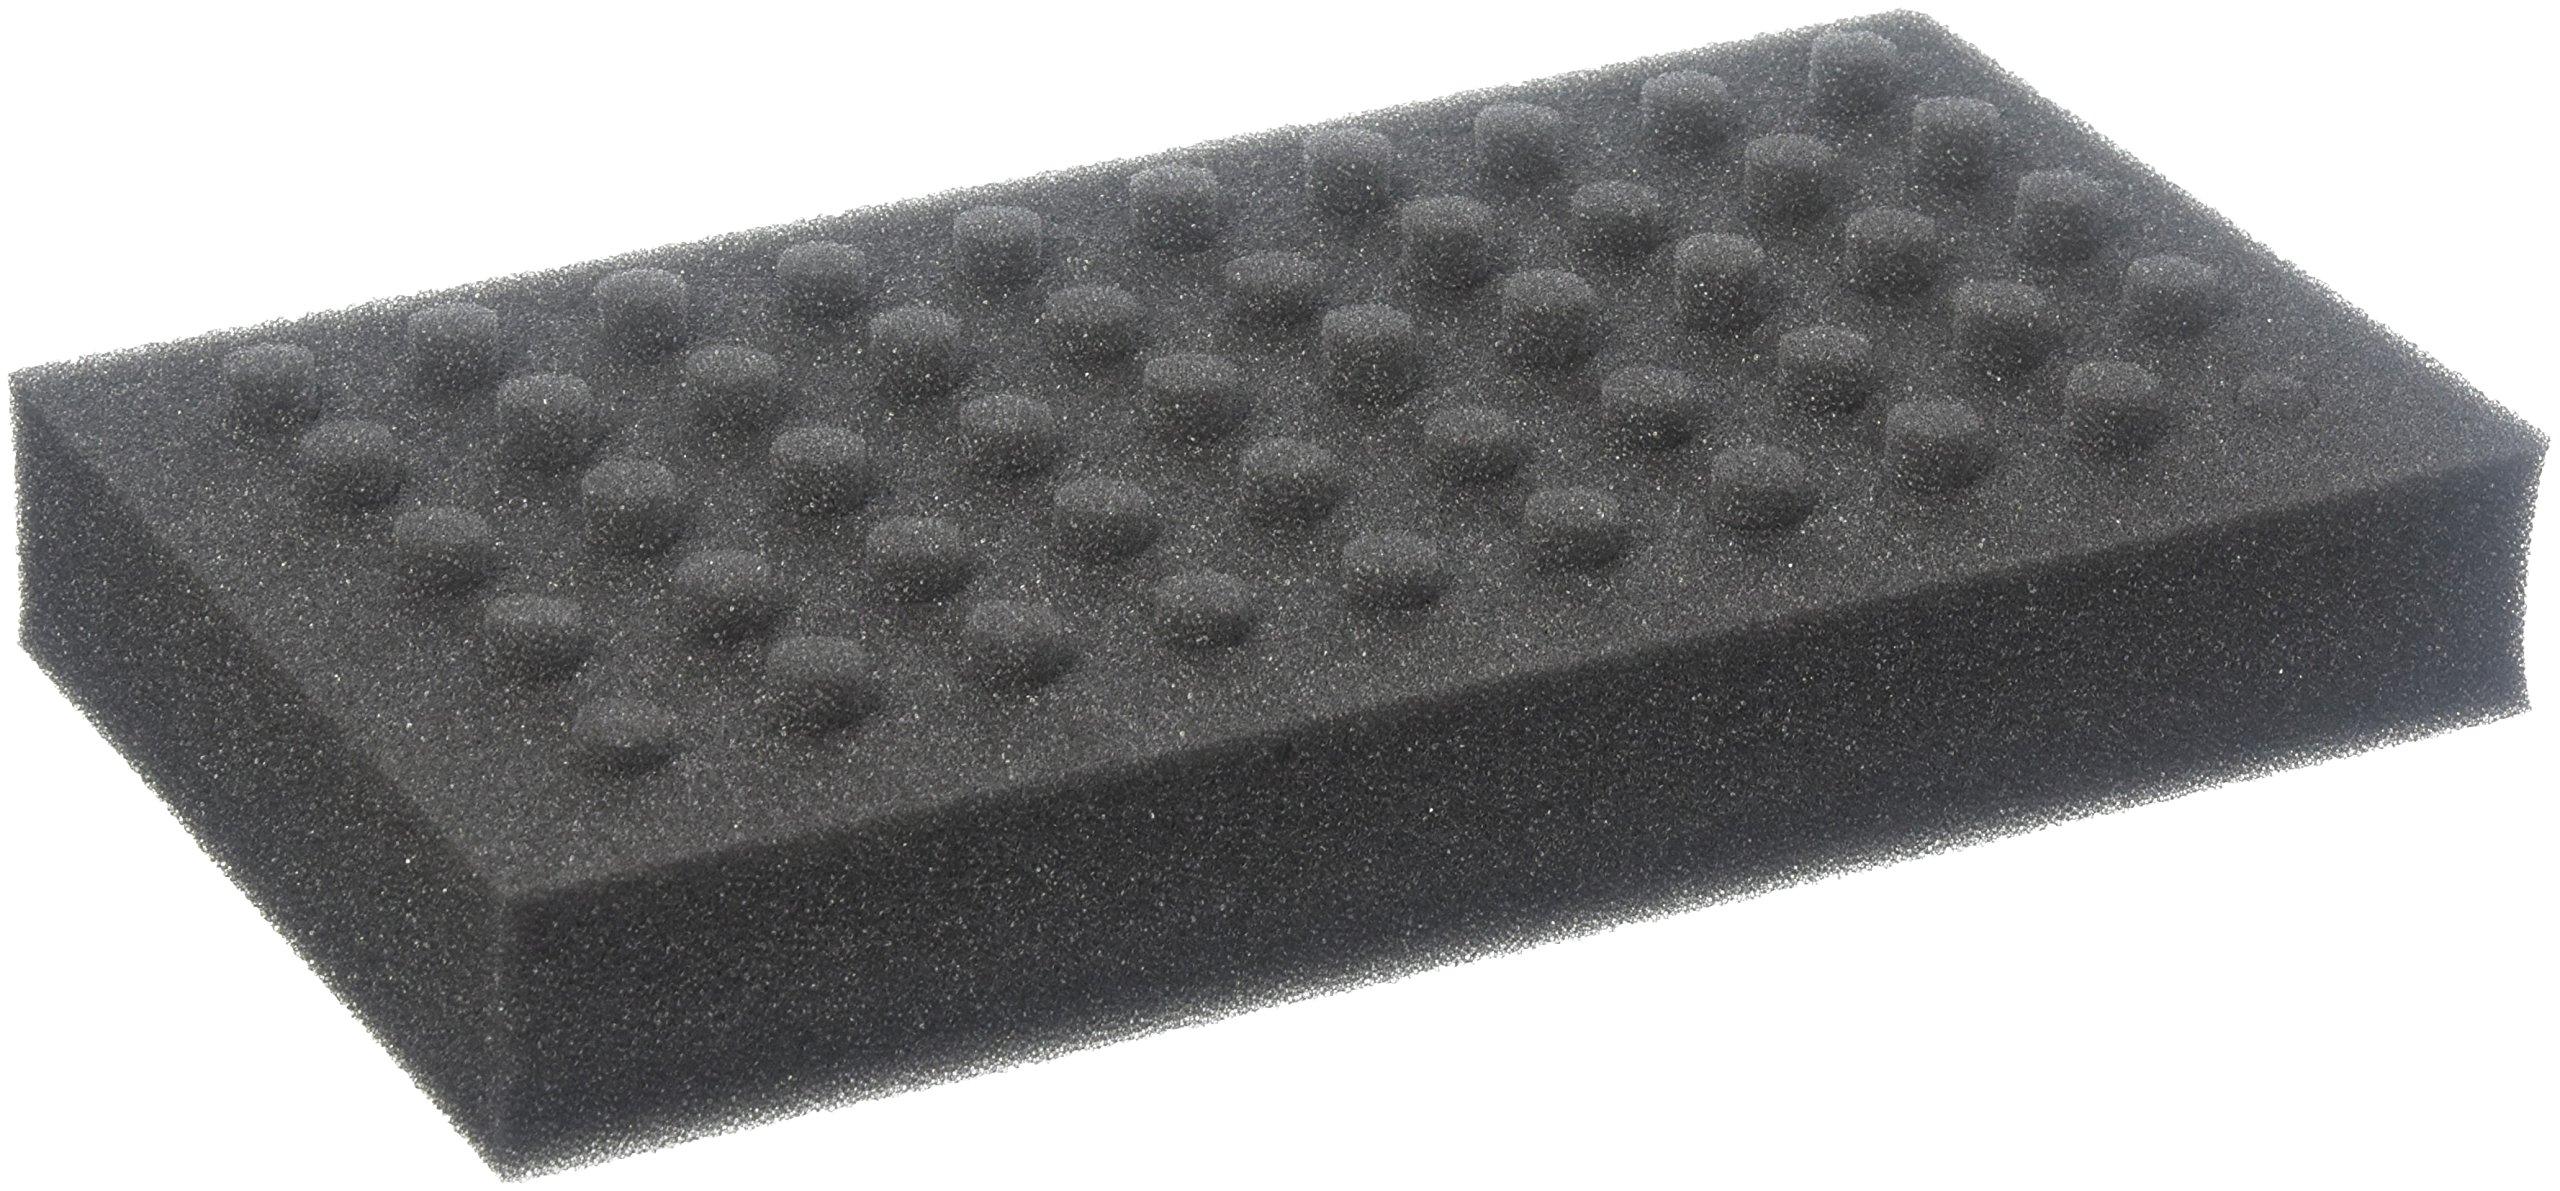 Jaece Industries FTR-100 Foam Test Tube Rack, 9'' x 5.25'' x 1.25'' Size, Small (Pack of 6)